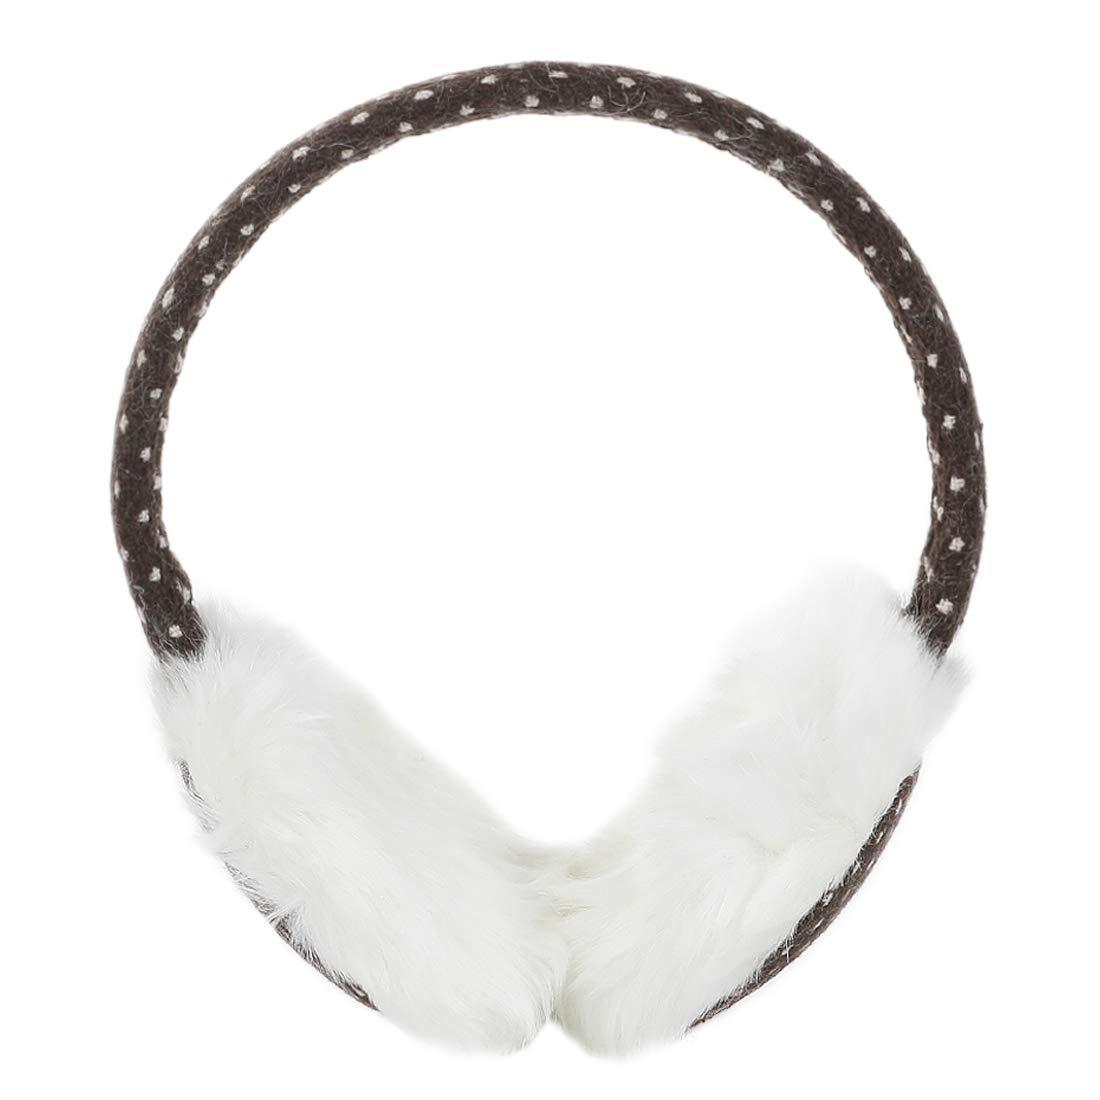 sourcingmap Women Winter White Faux Fur Flower Ear Cover Warmer Earmuffs Knitted Plush Pad Earlap a11121900ux0341